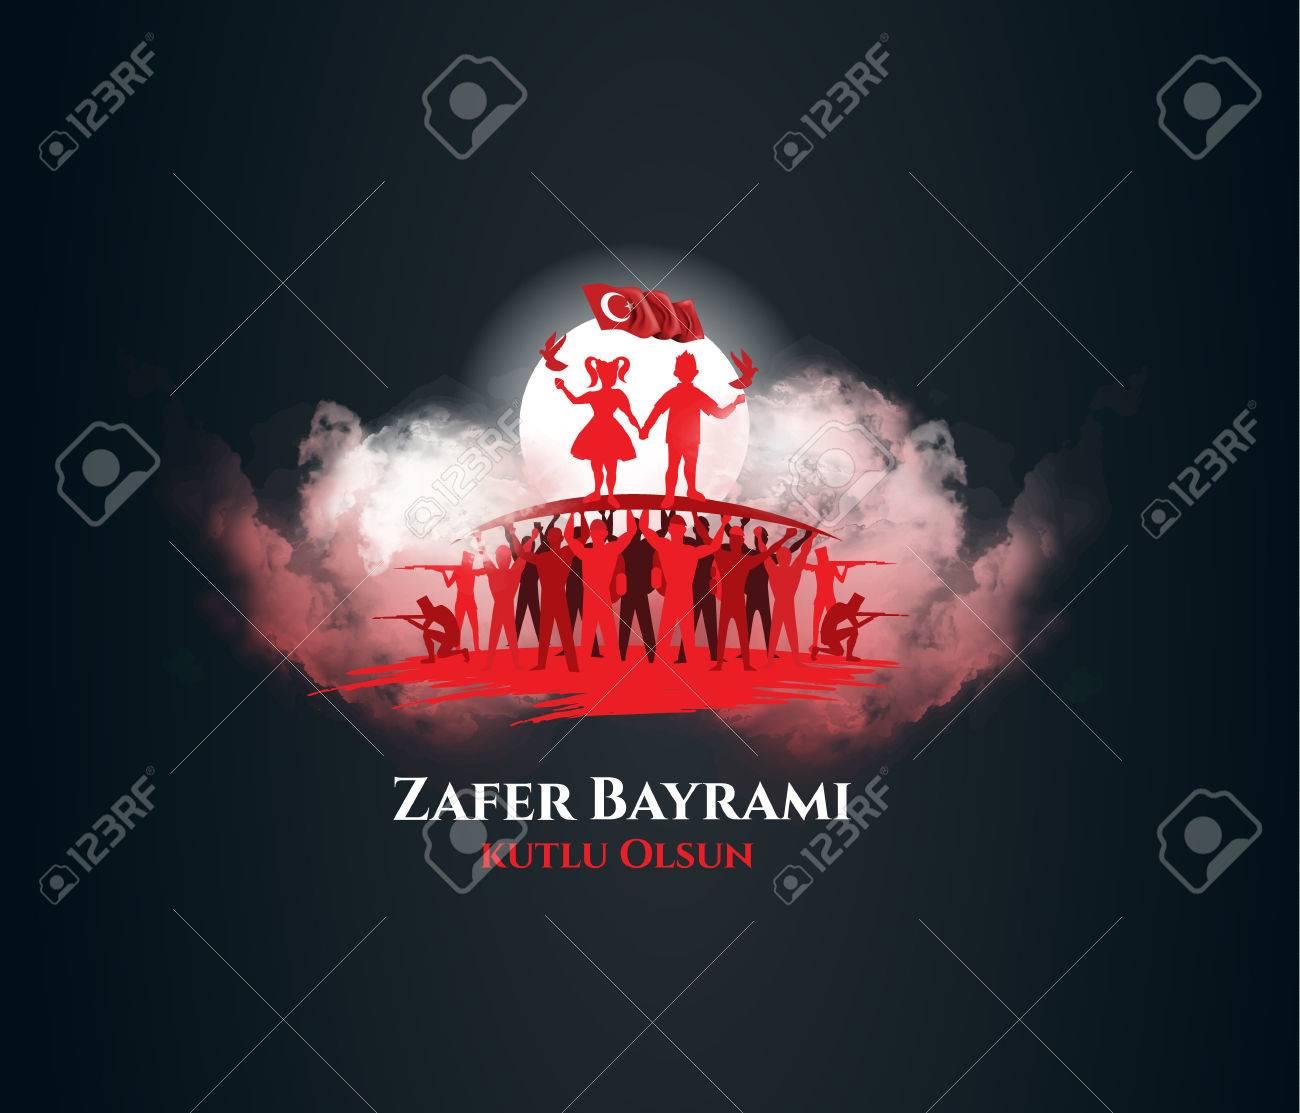 30 august zafer bayrami - 84365953